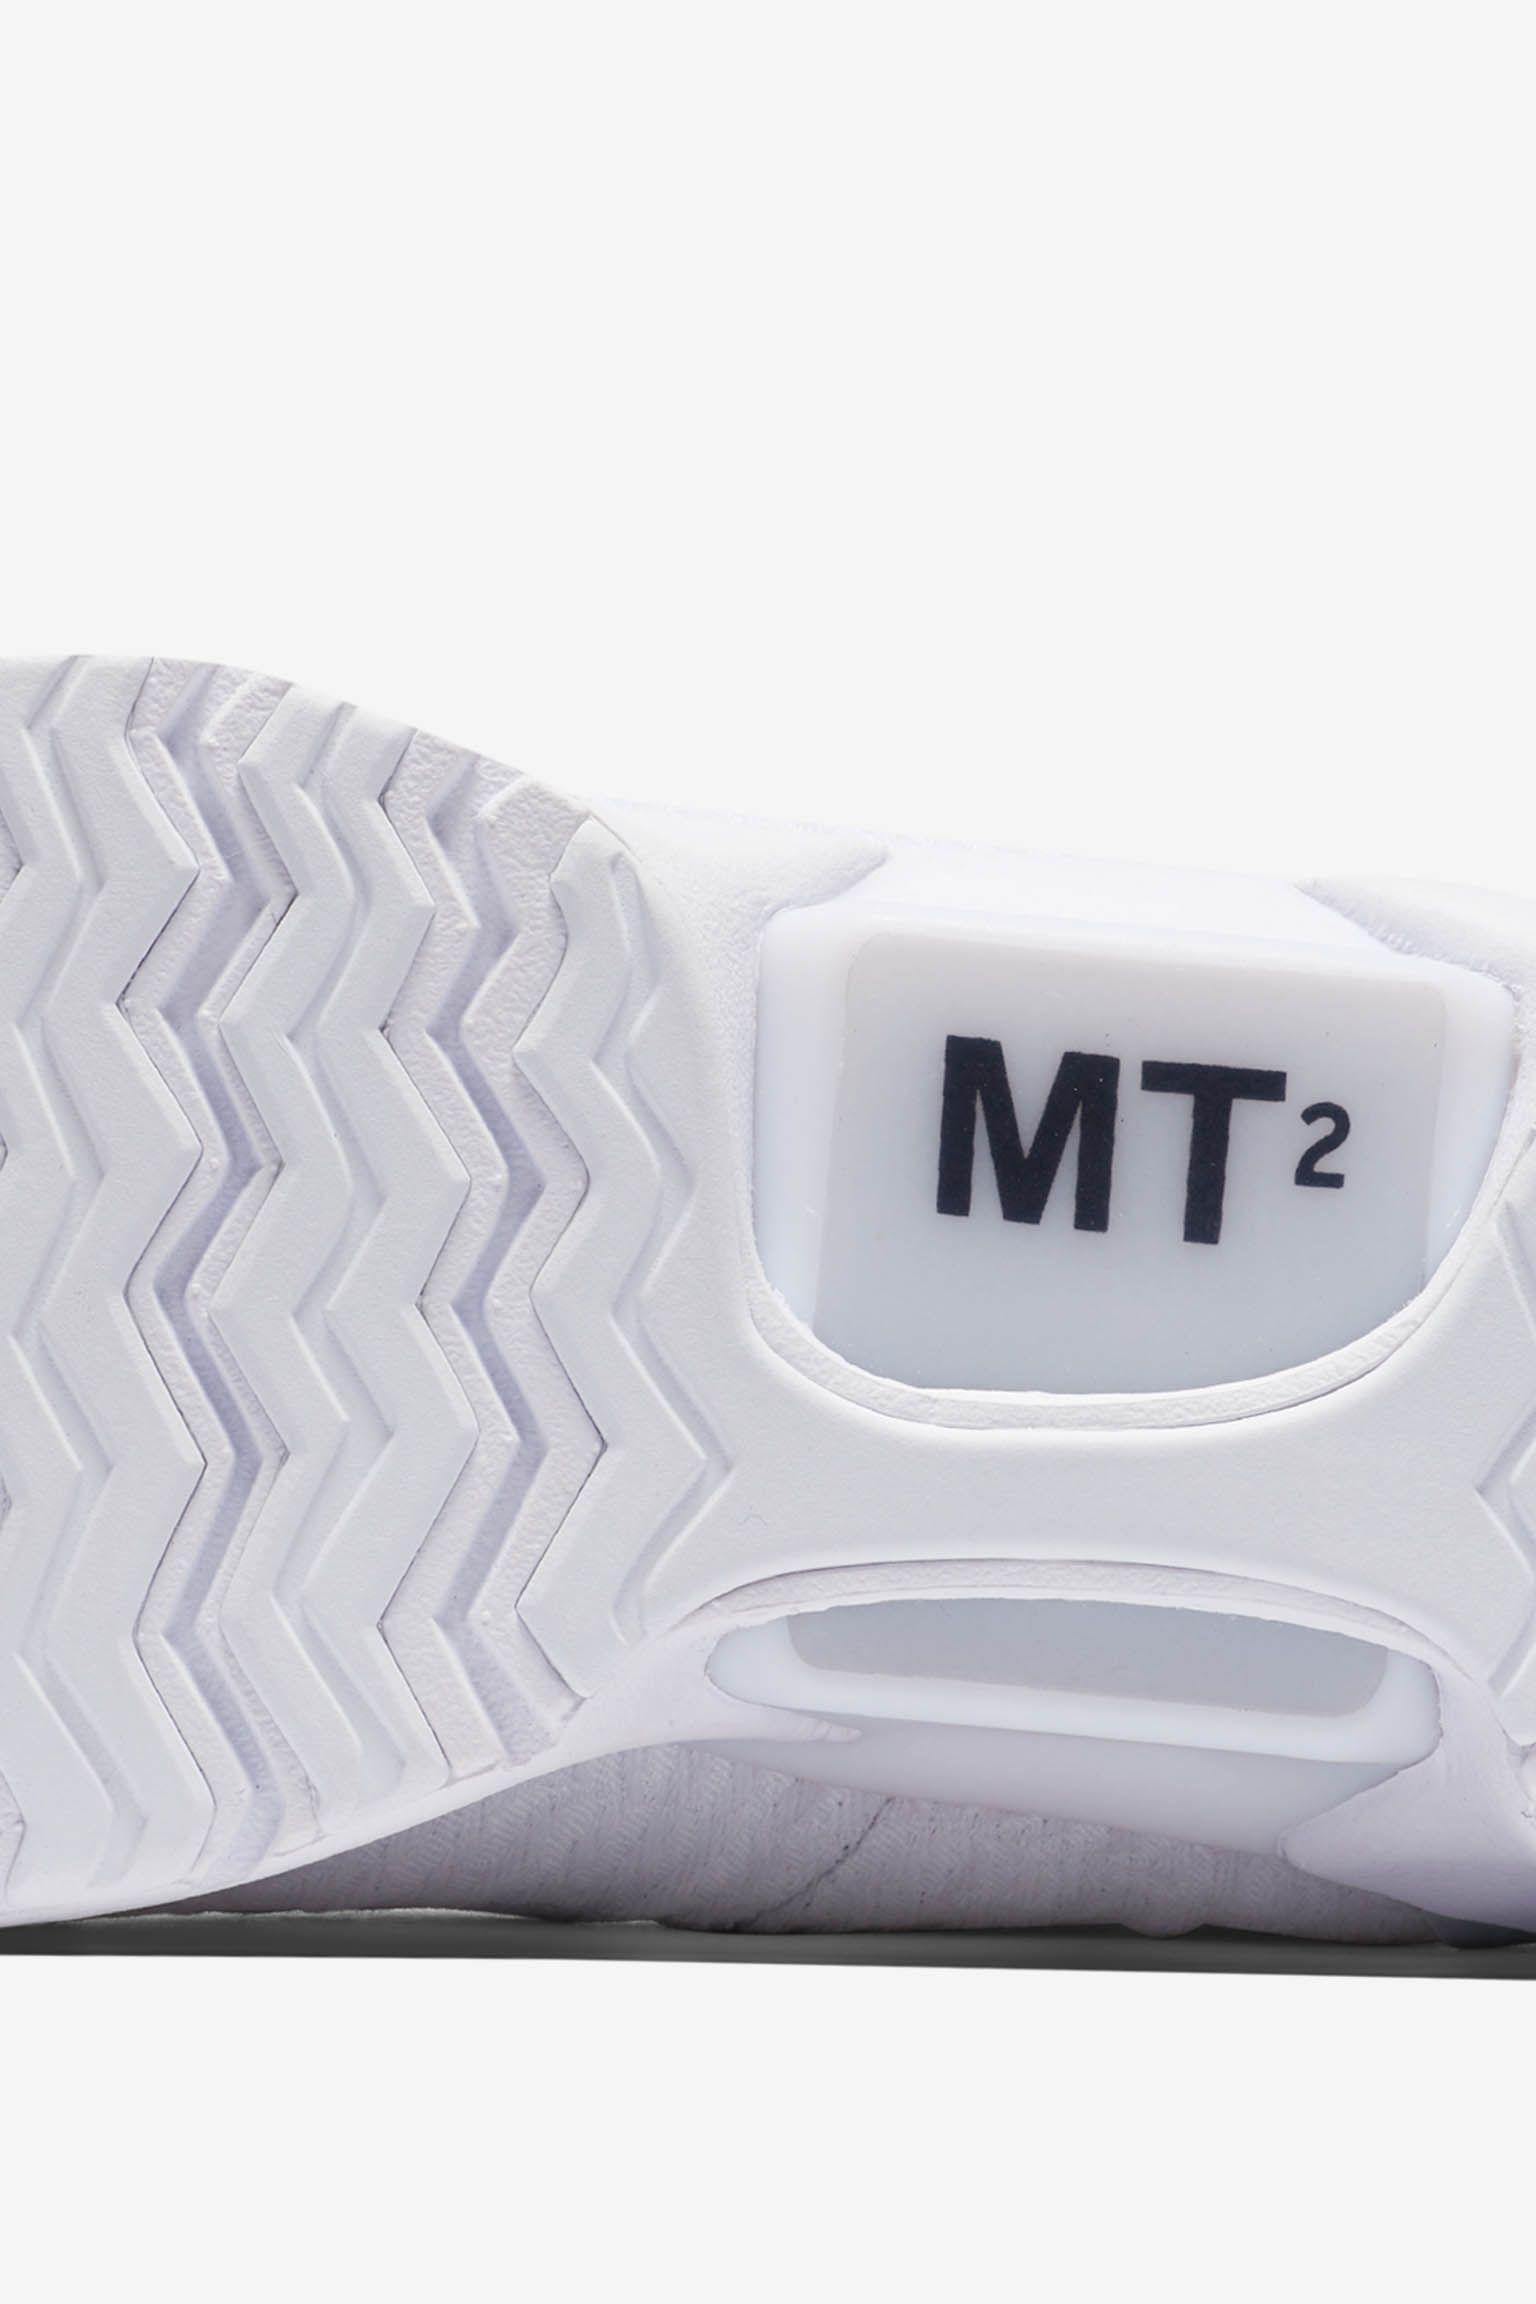 Nike HyperAdapt 1.0 'White & Pure Platinum' Release Date